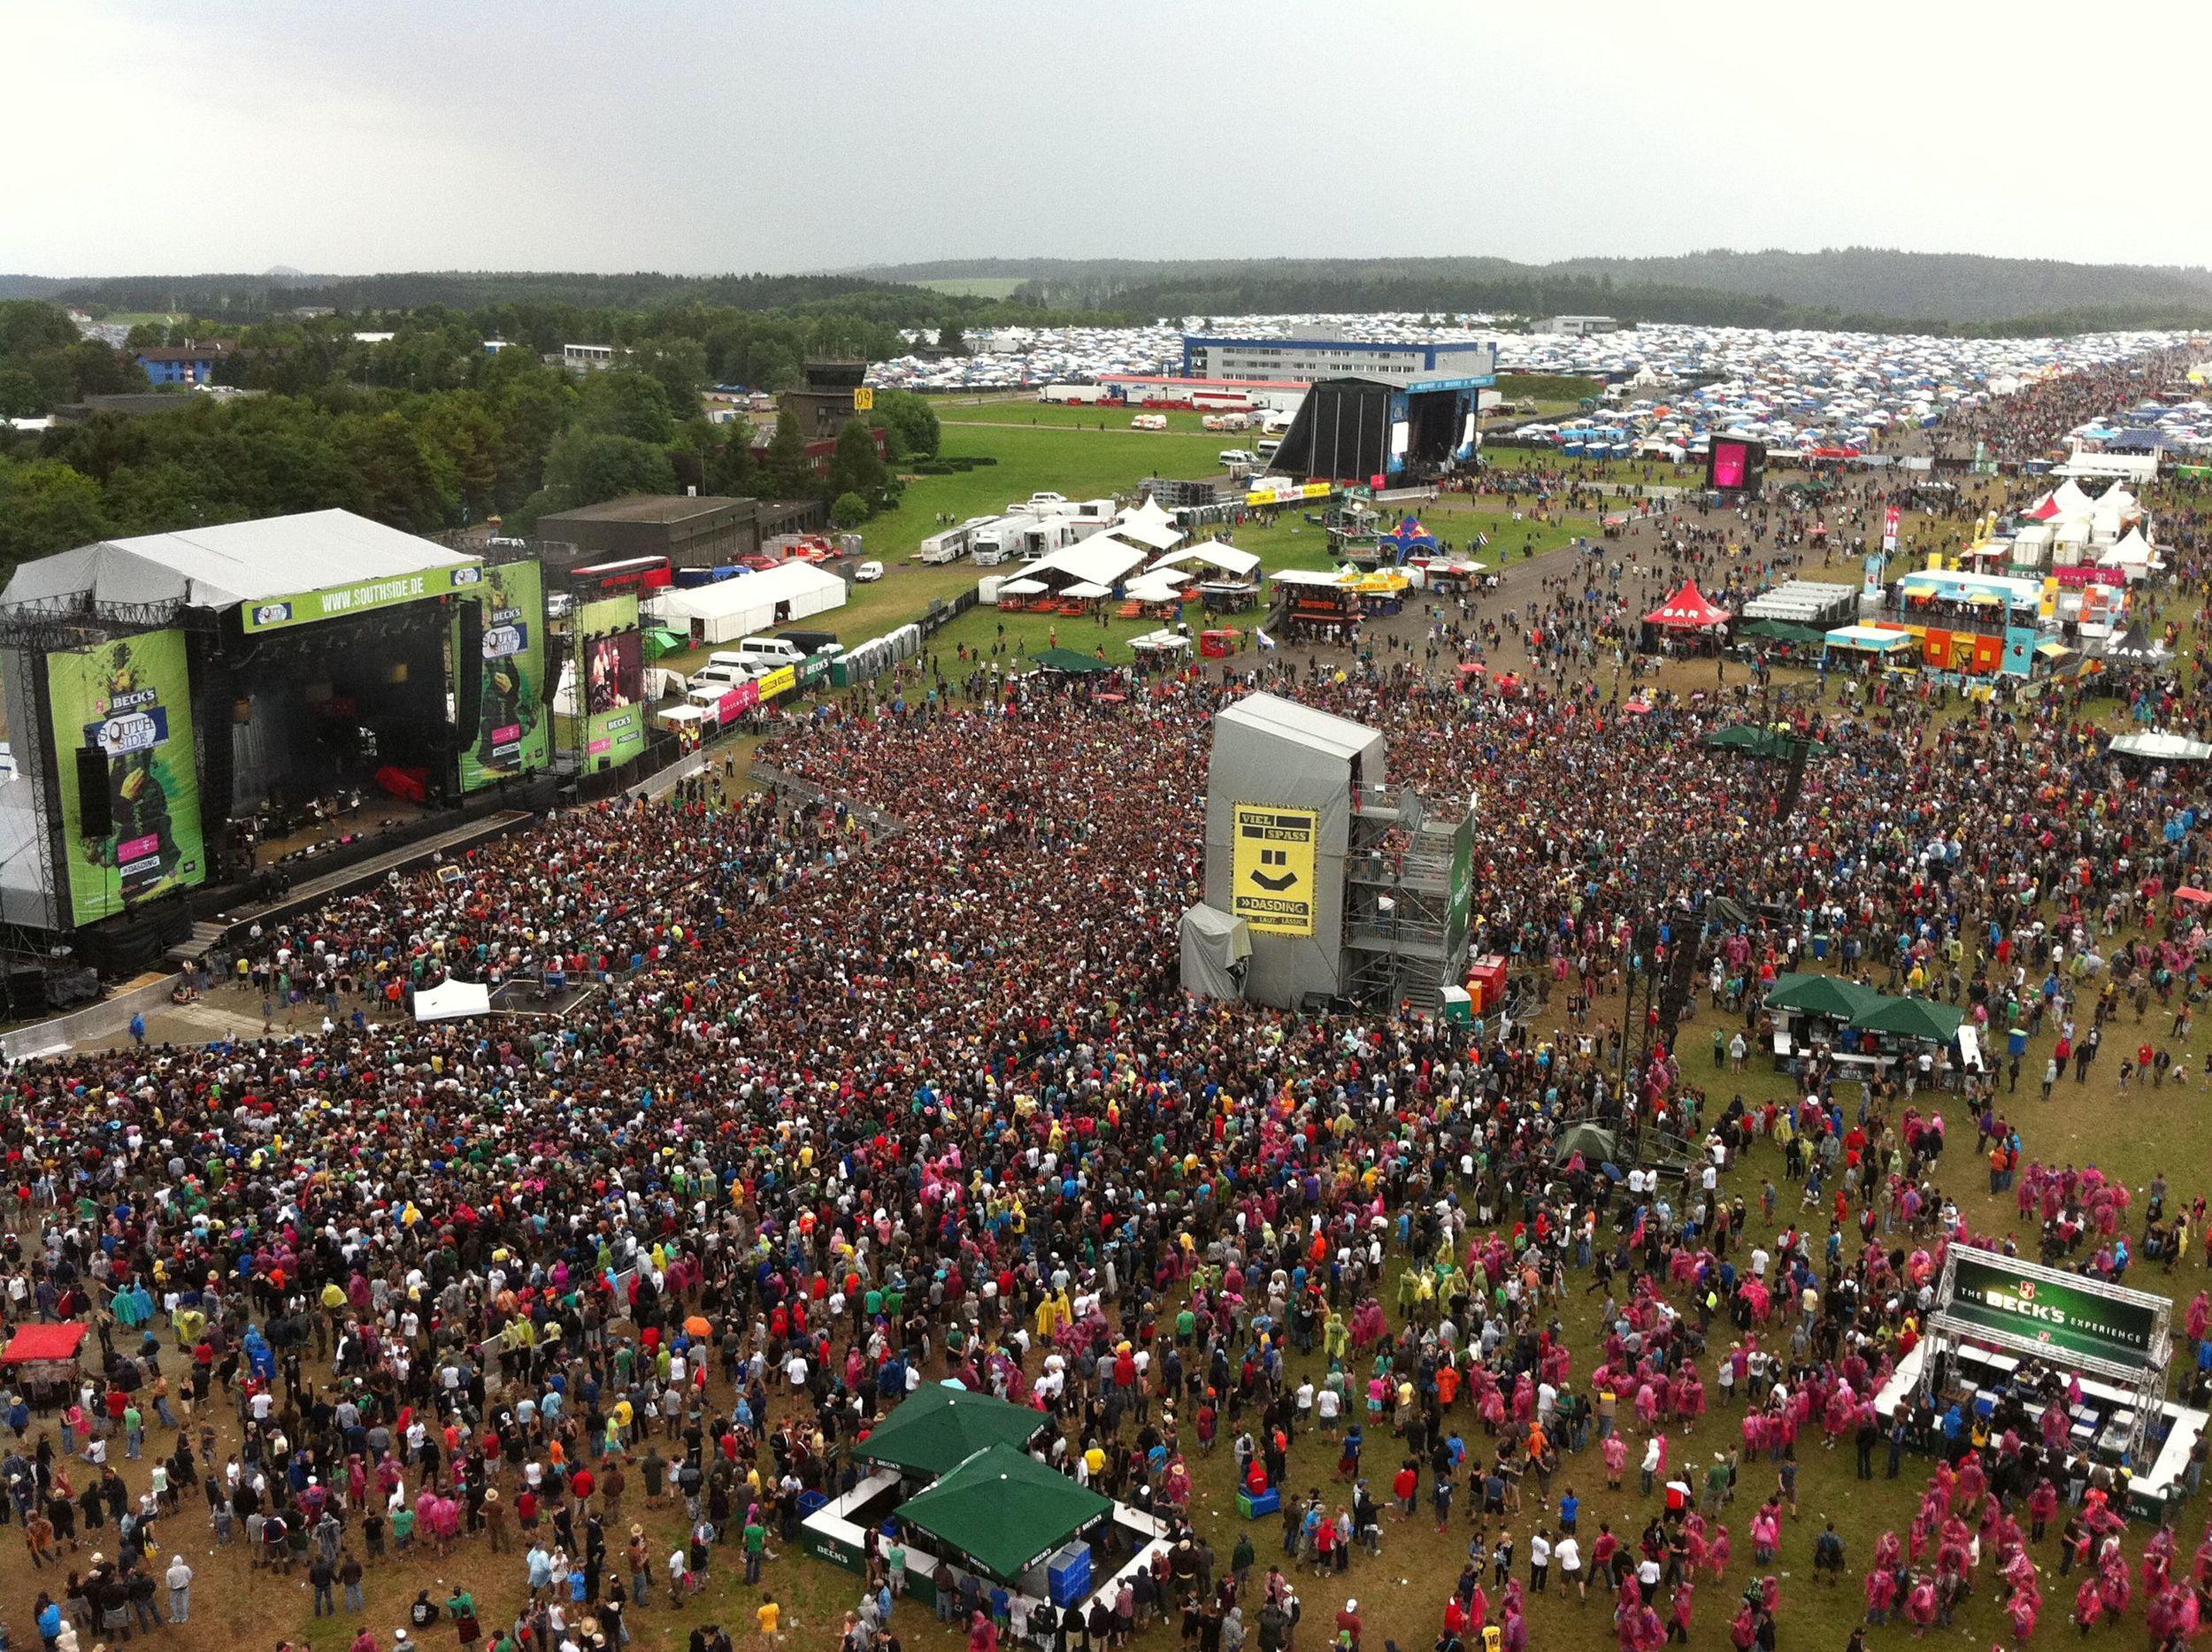 Der Blick von oben, endloses Festivalgelände (Southside 2011)